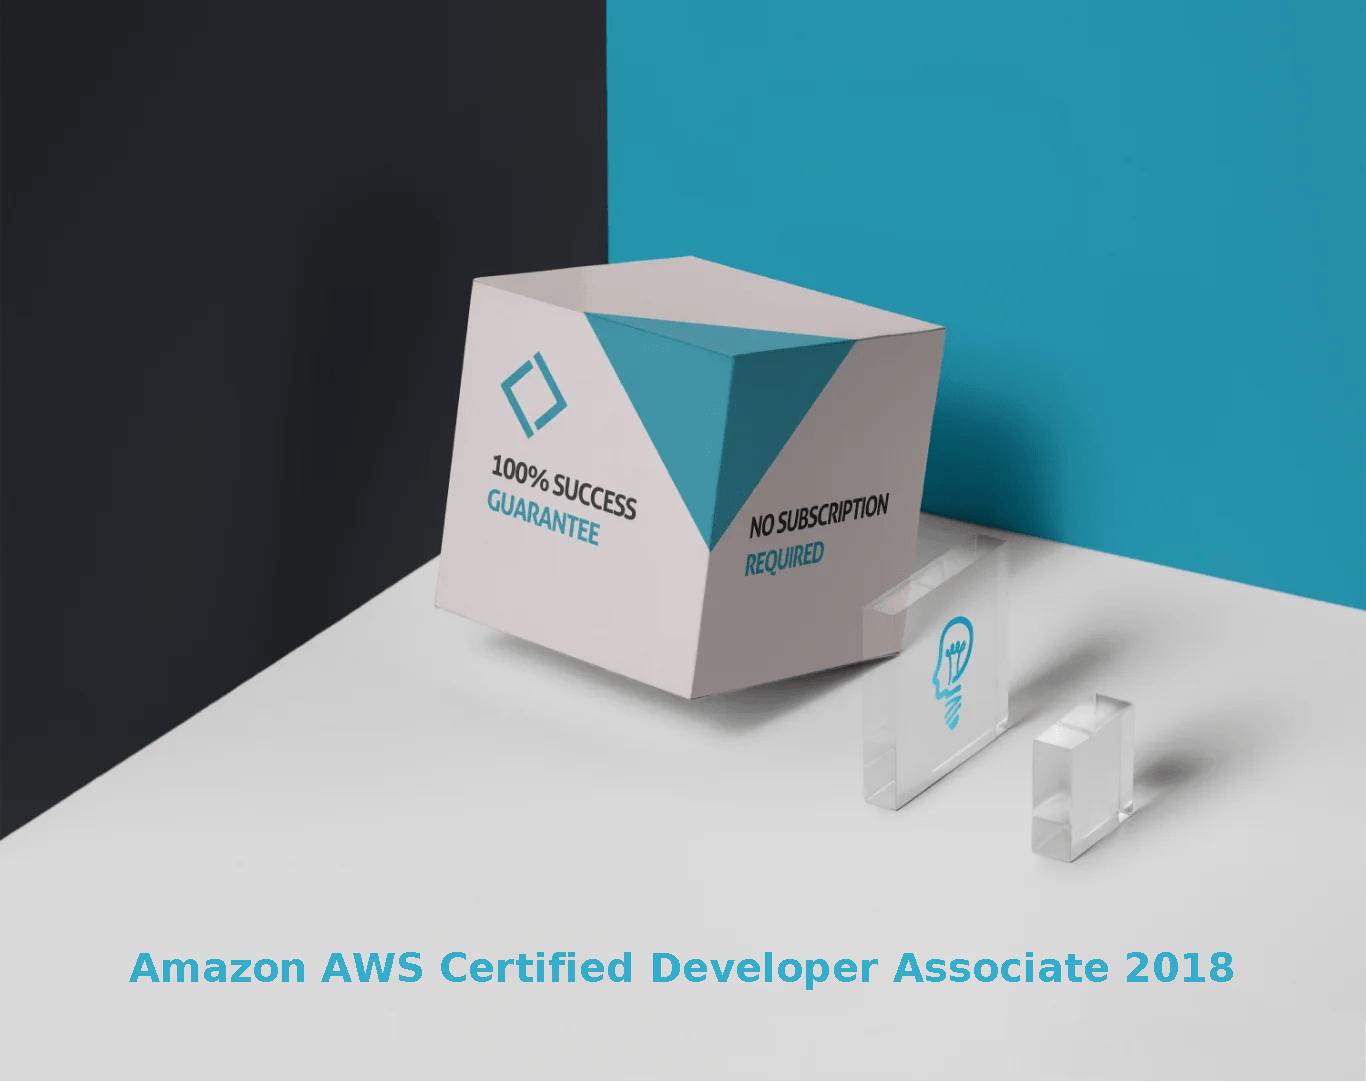 Amazon AWS Certified Developer Associate 2018 Exams